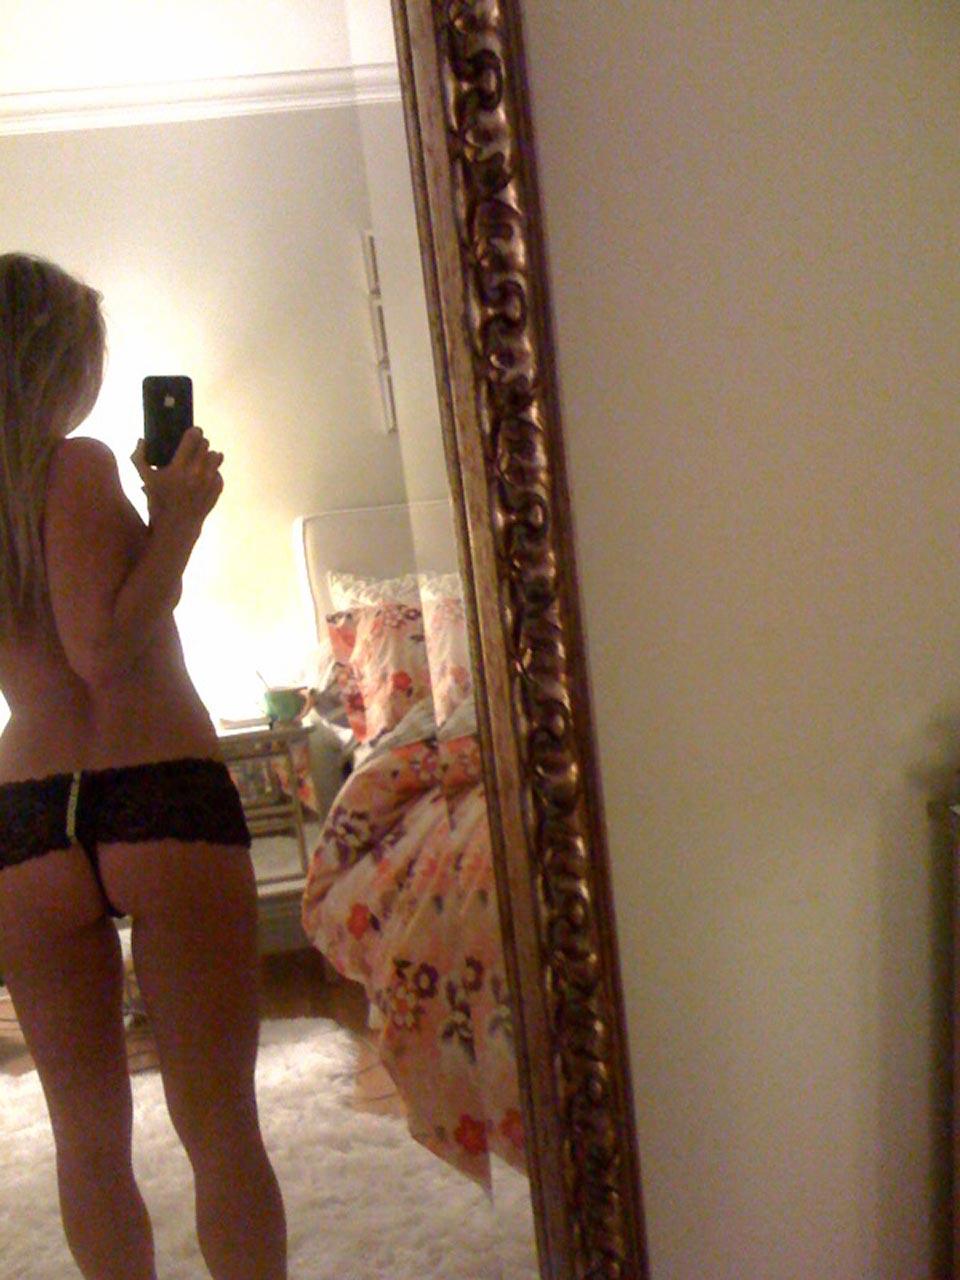 Glee Star Becca Tobin Nude Leaked Photos Uncensored Pics-8977